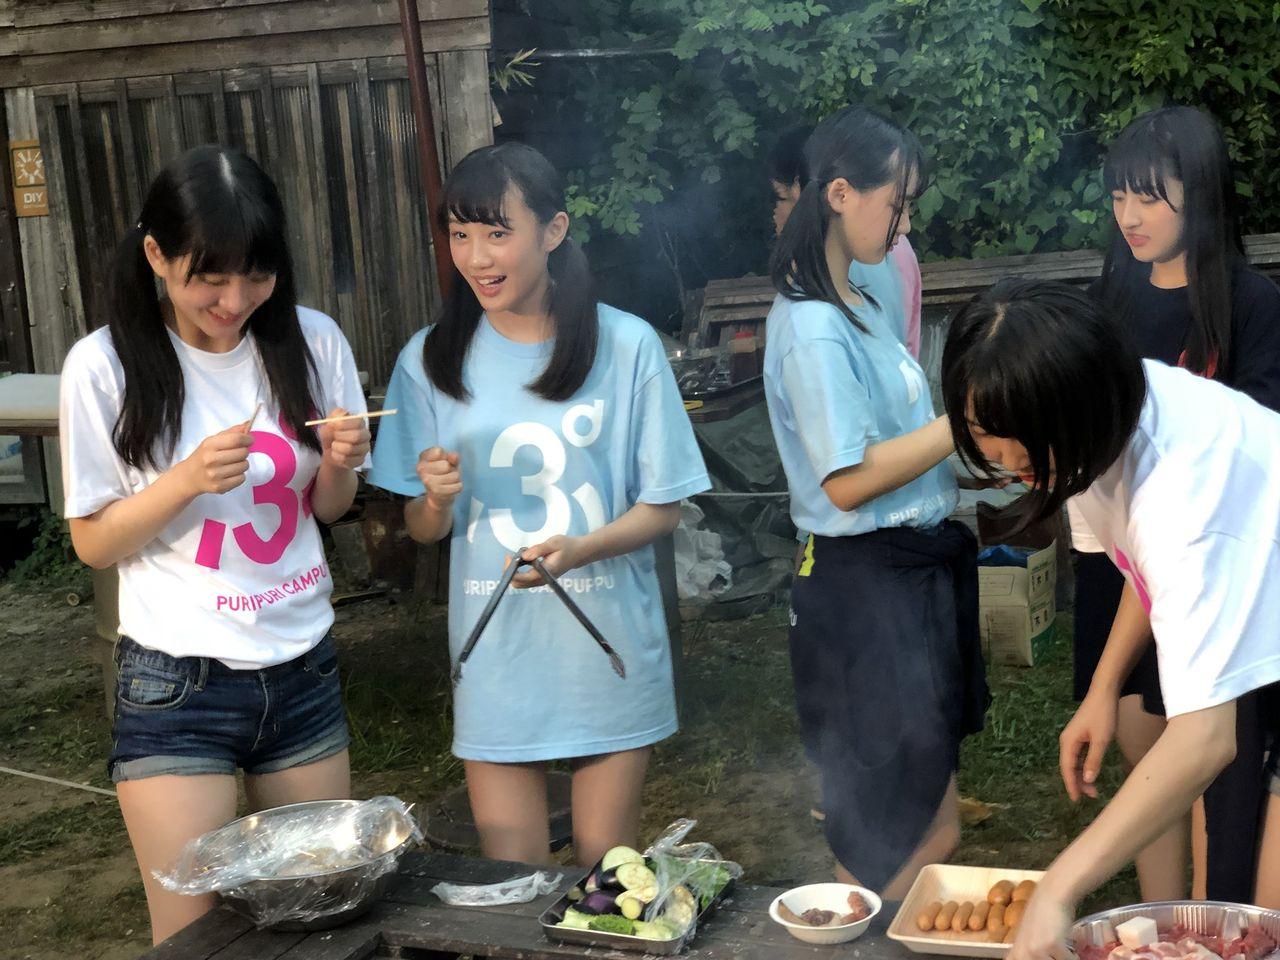 【NMB48】新YNN『キャンプっぷ』フィナーレ 実況・感想など